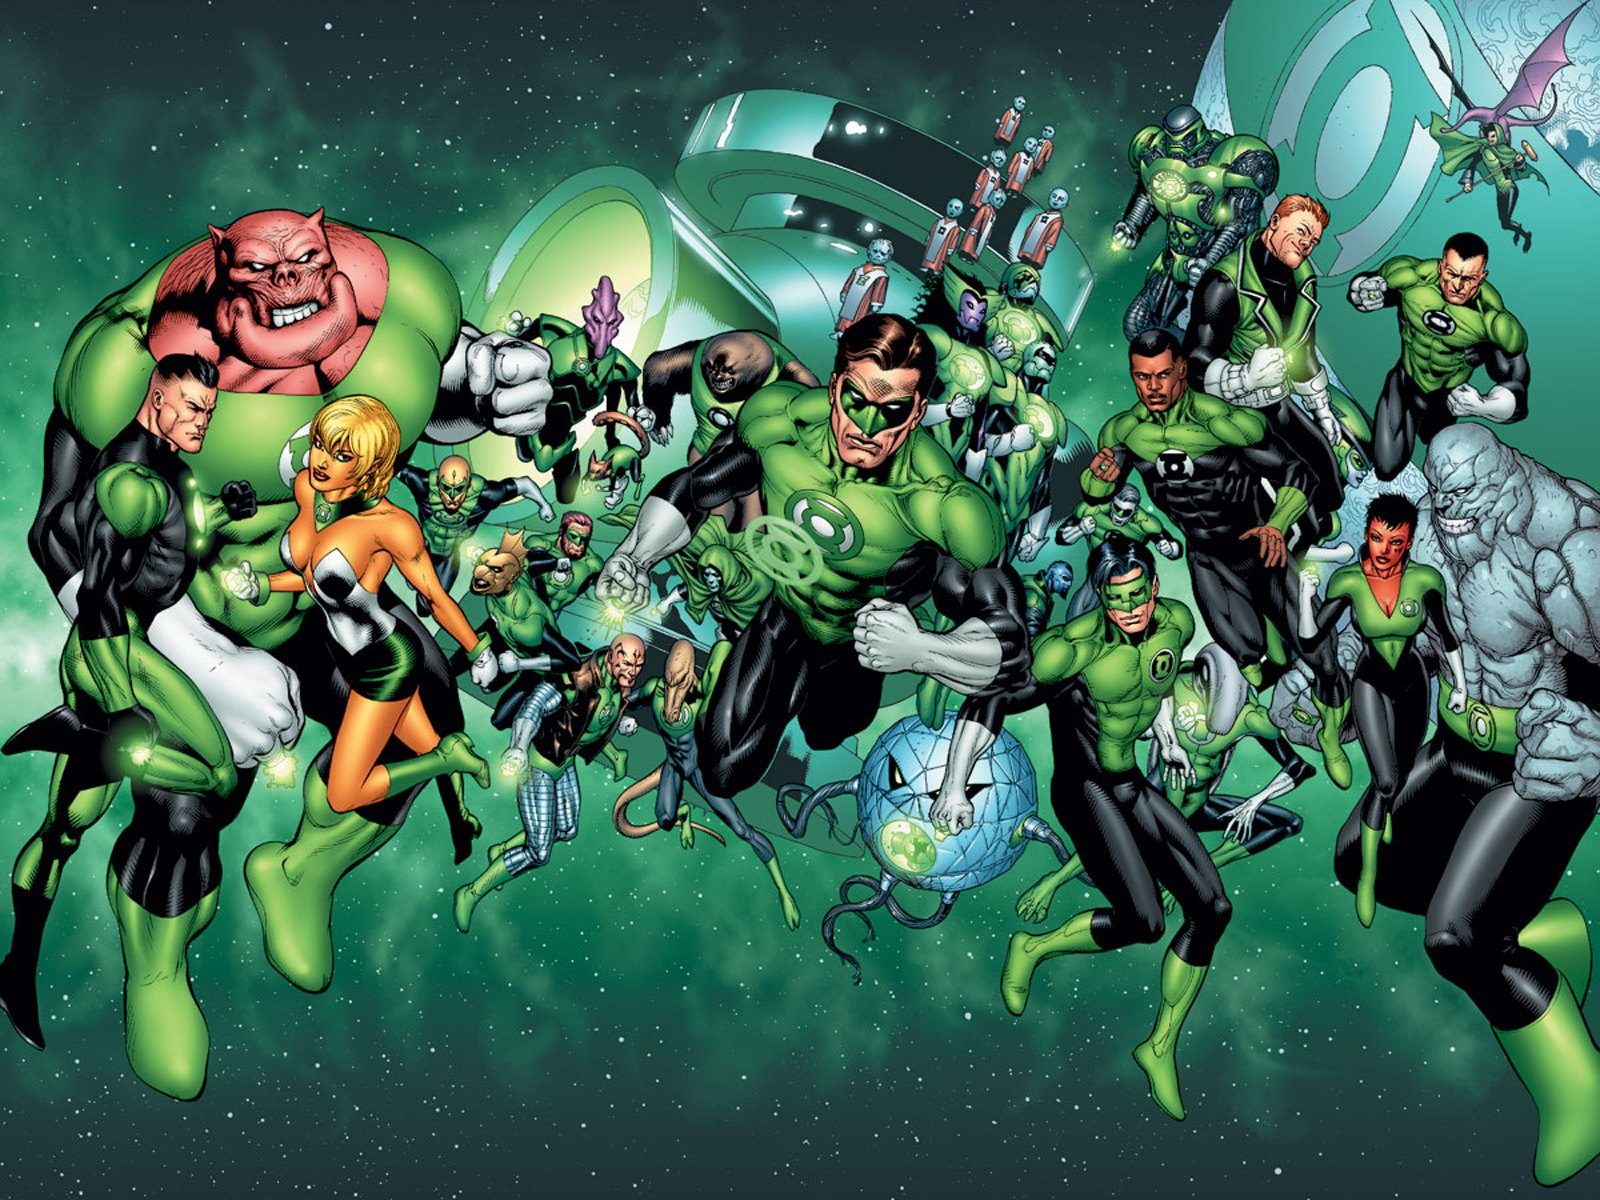 Green Lantern Corps.